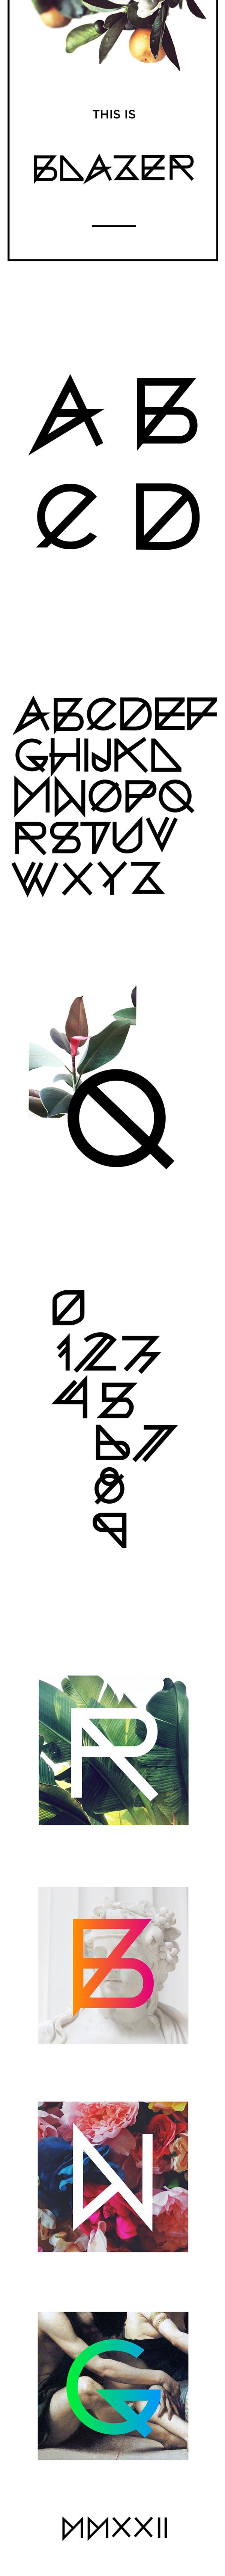 blazer font free freedom domenico ruffo geometric spring art poster